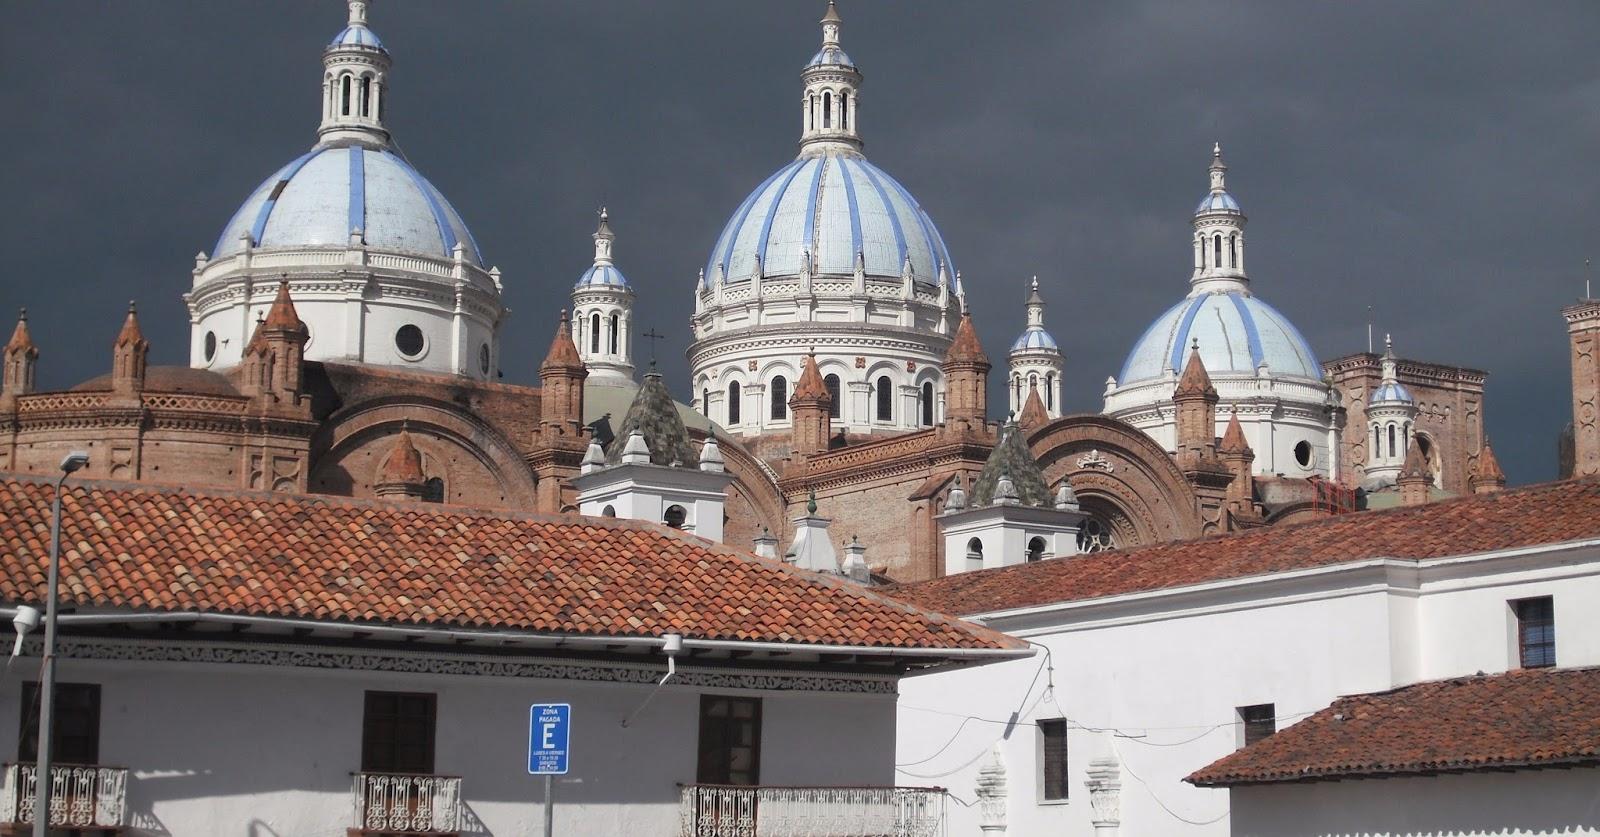 Ino Store Porto Vecchio andrew's travel stories : peru